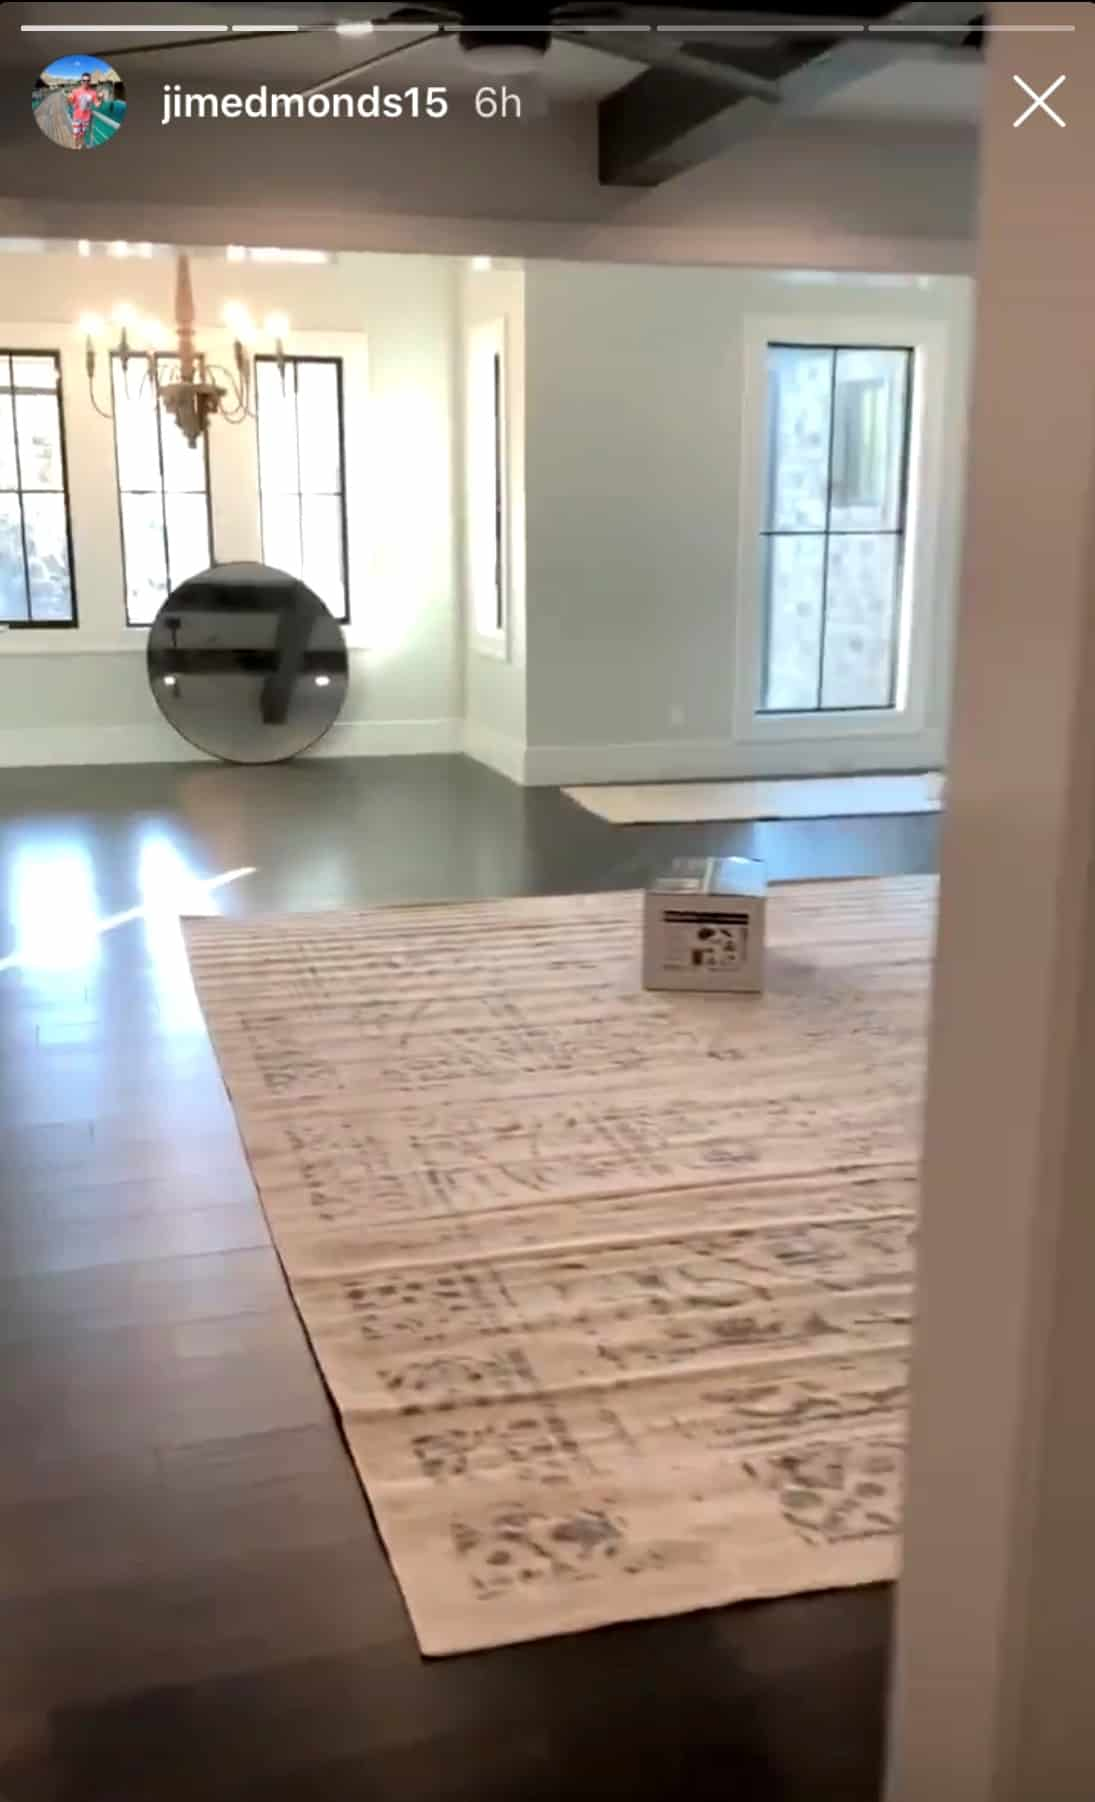 RHOC Jim Edmonds Offers Look Inside His New Home